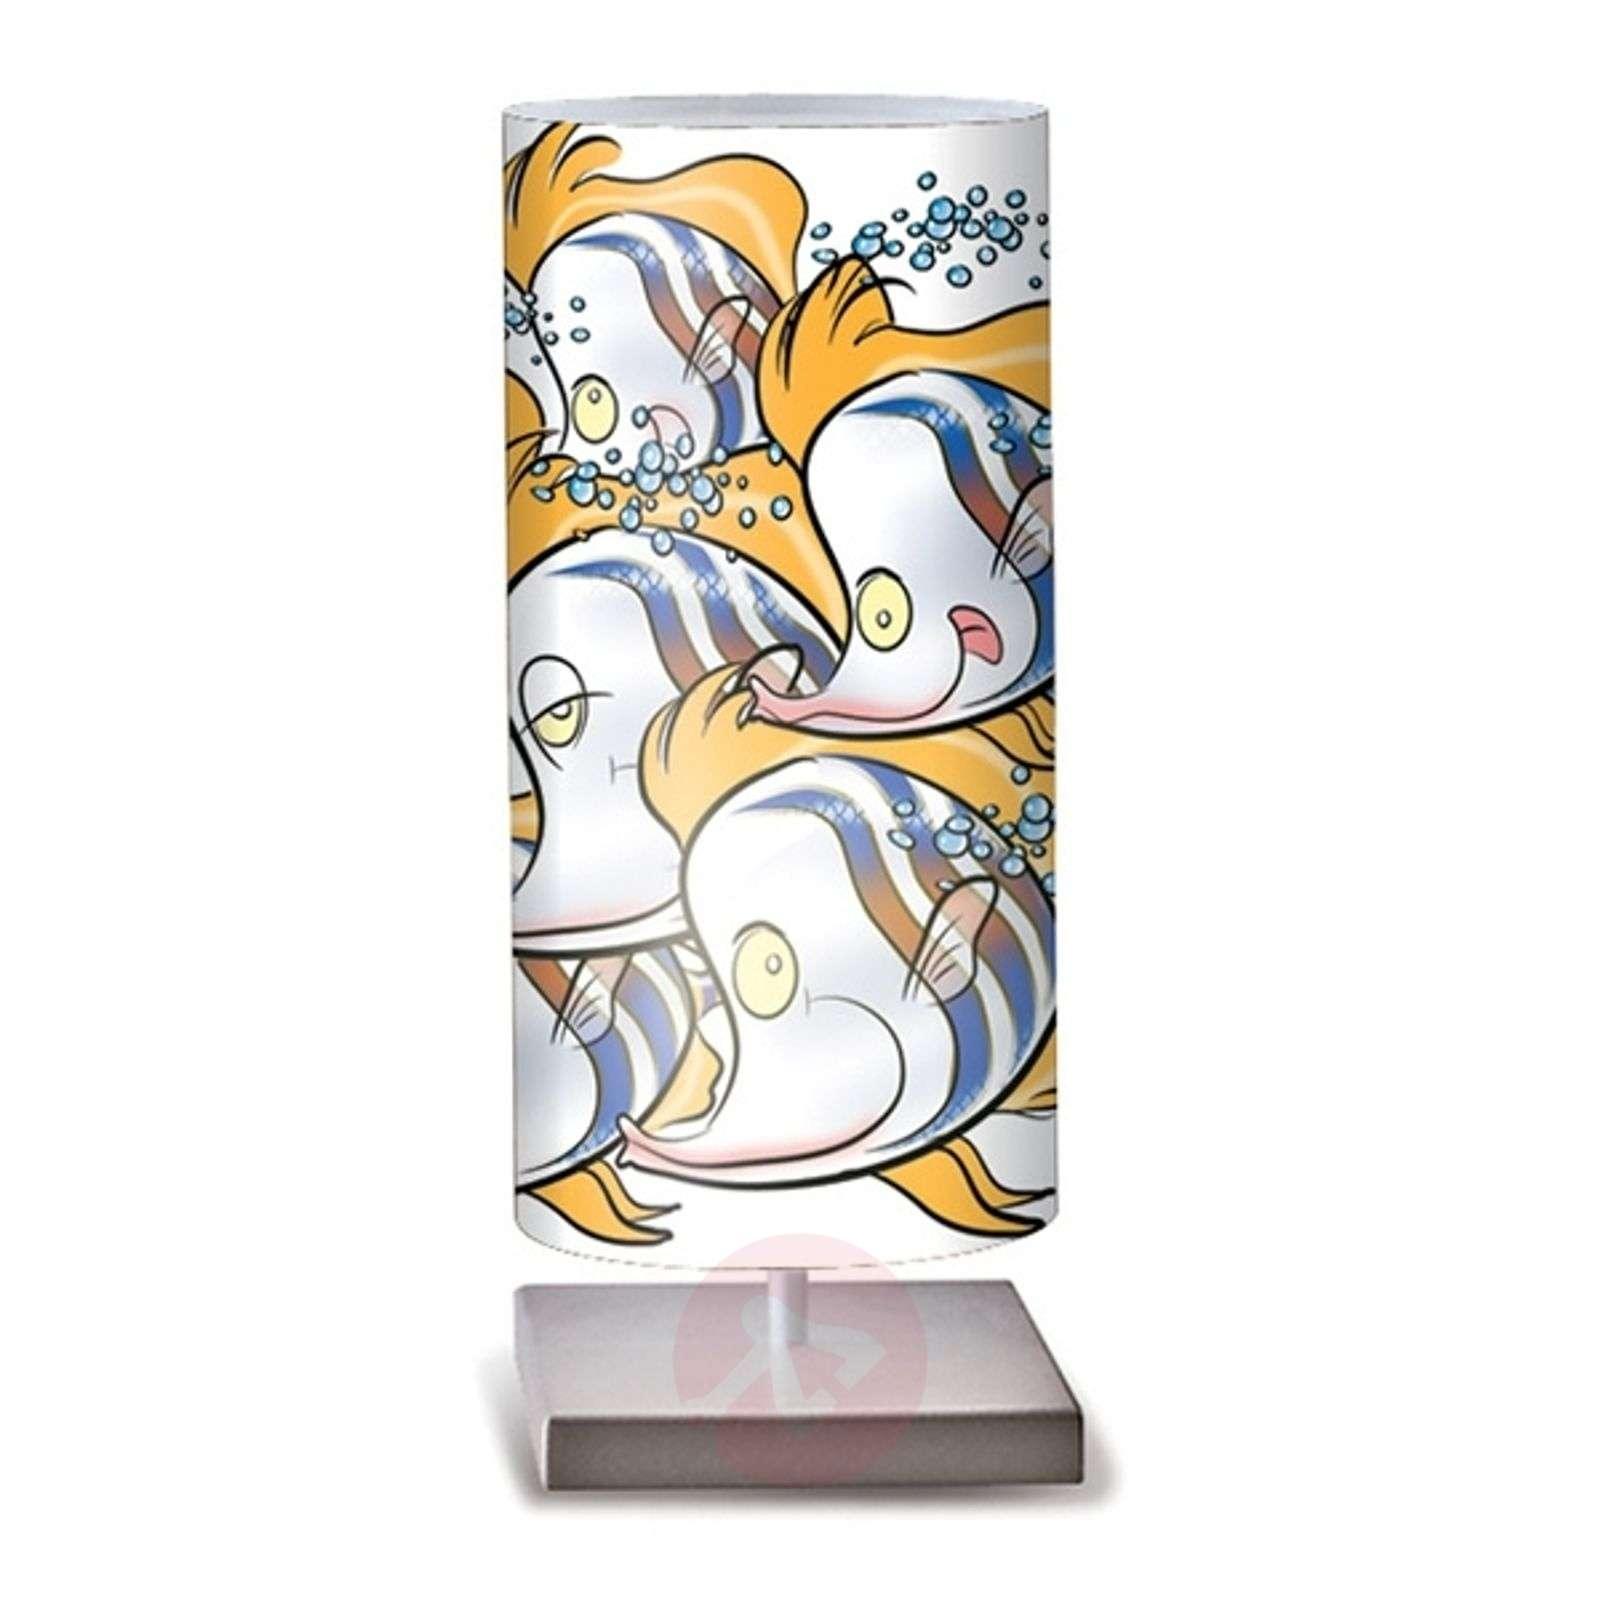 Adorable table lamp Pesci-1056058-01